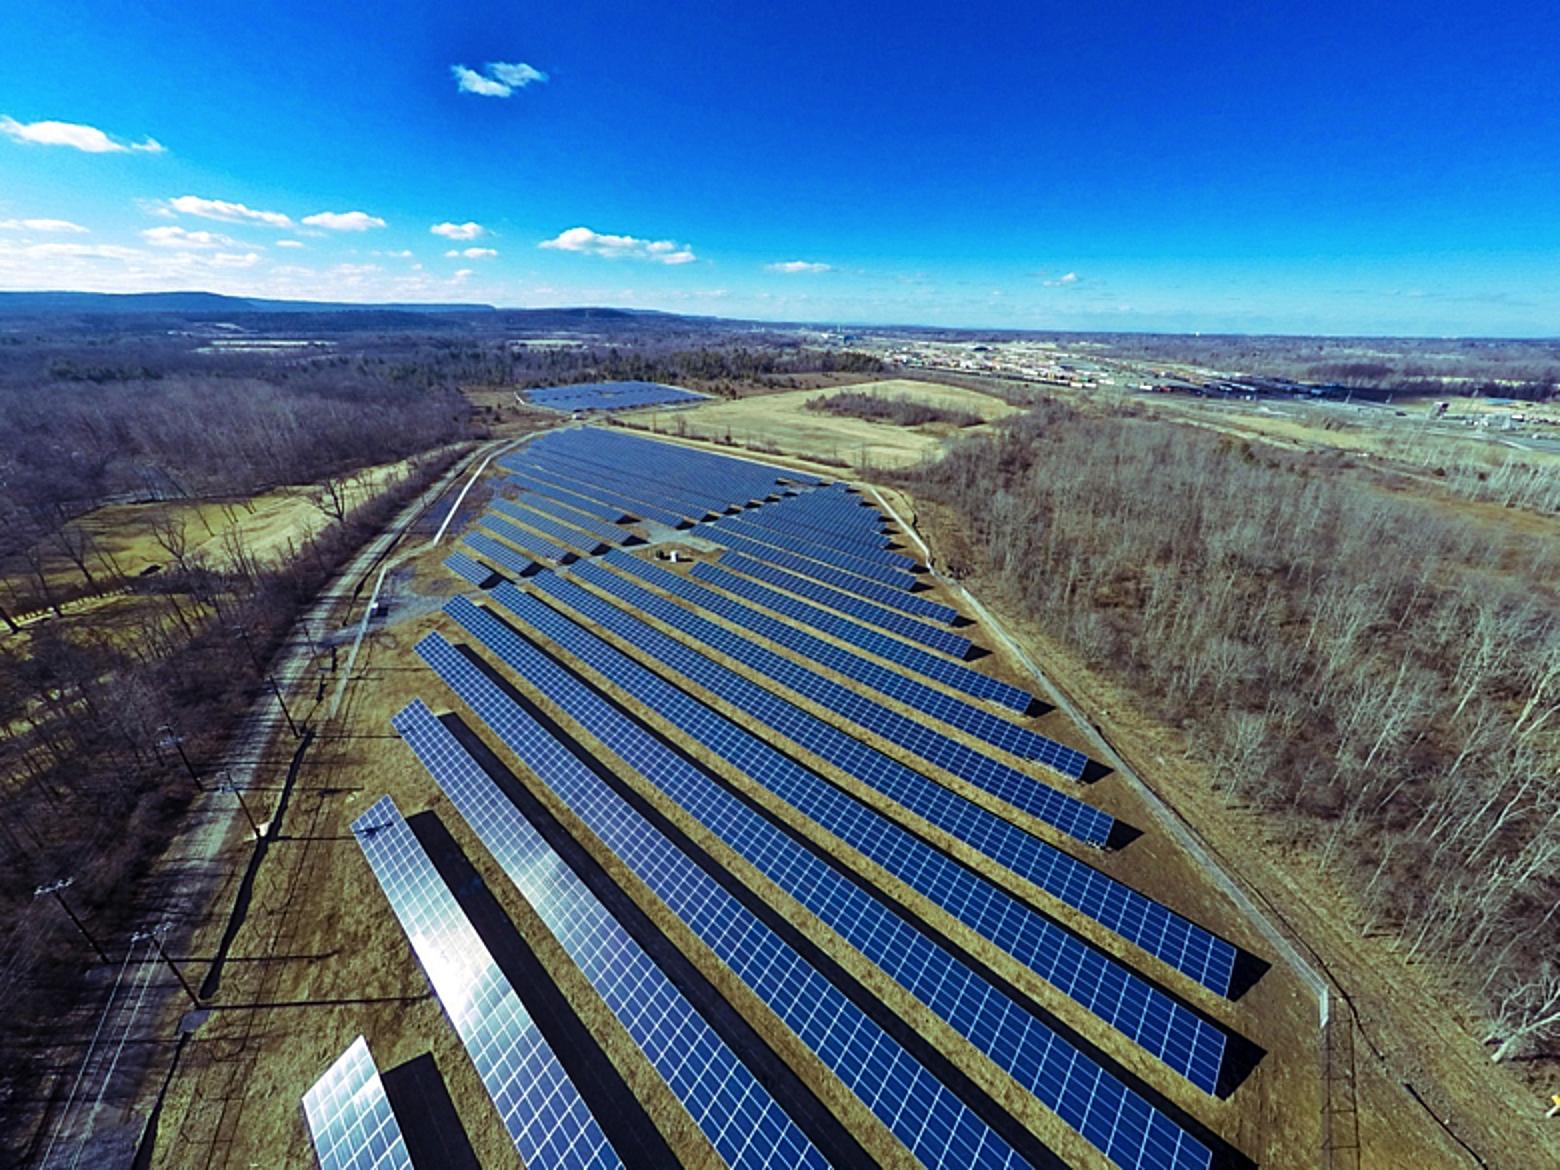 Town of Bethlehem solar photovoltaic system.  NextEra Energy Resources